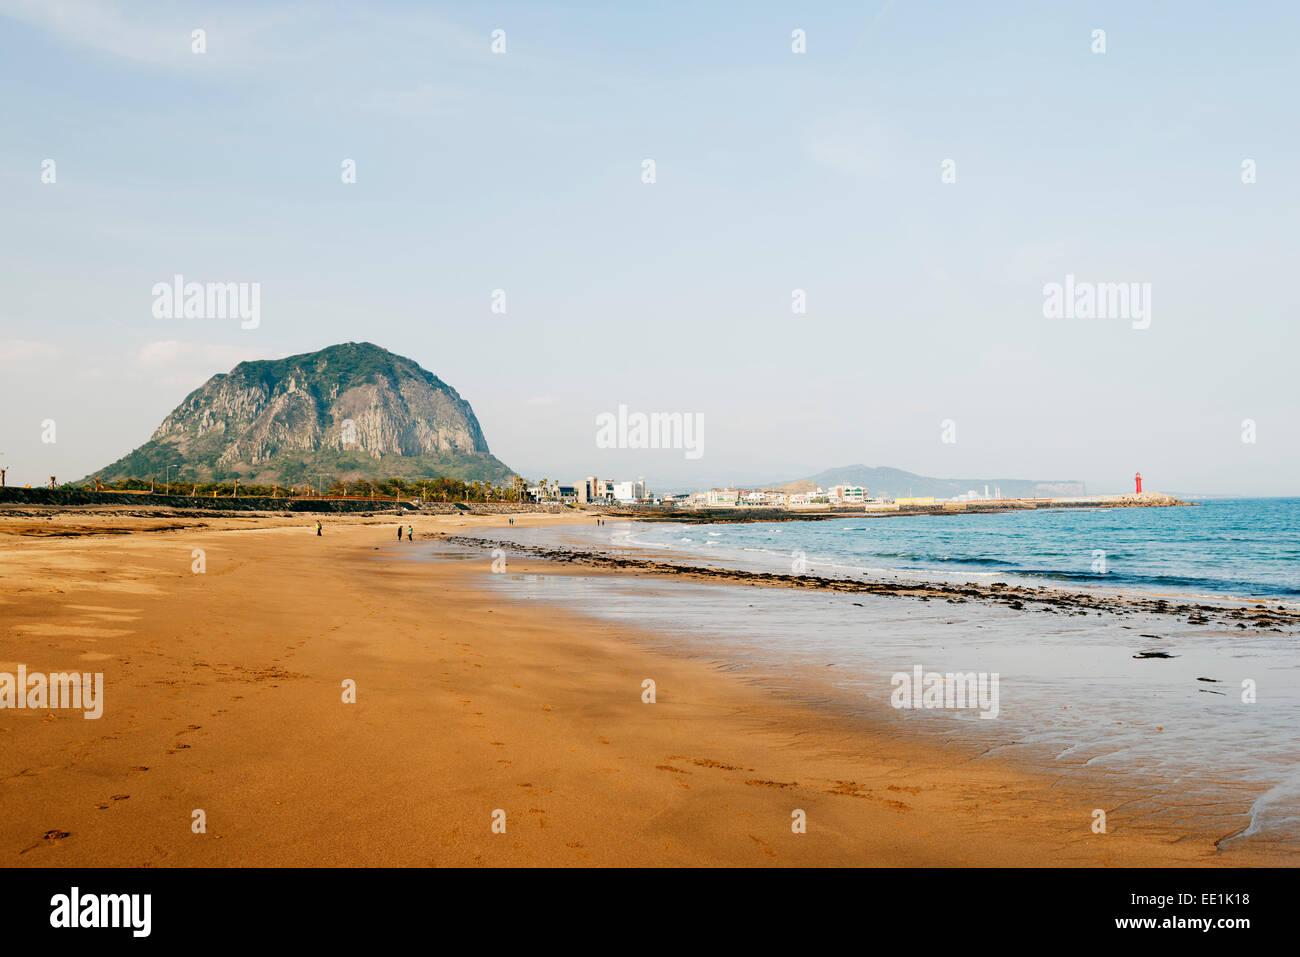 Mount Sanbangsan, Jeju Island, UNESCO World Heritage Site, South Korea, Asia - Stock Image